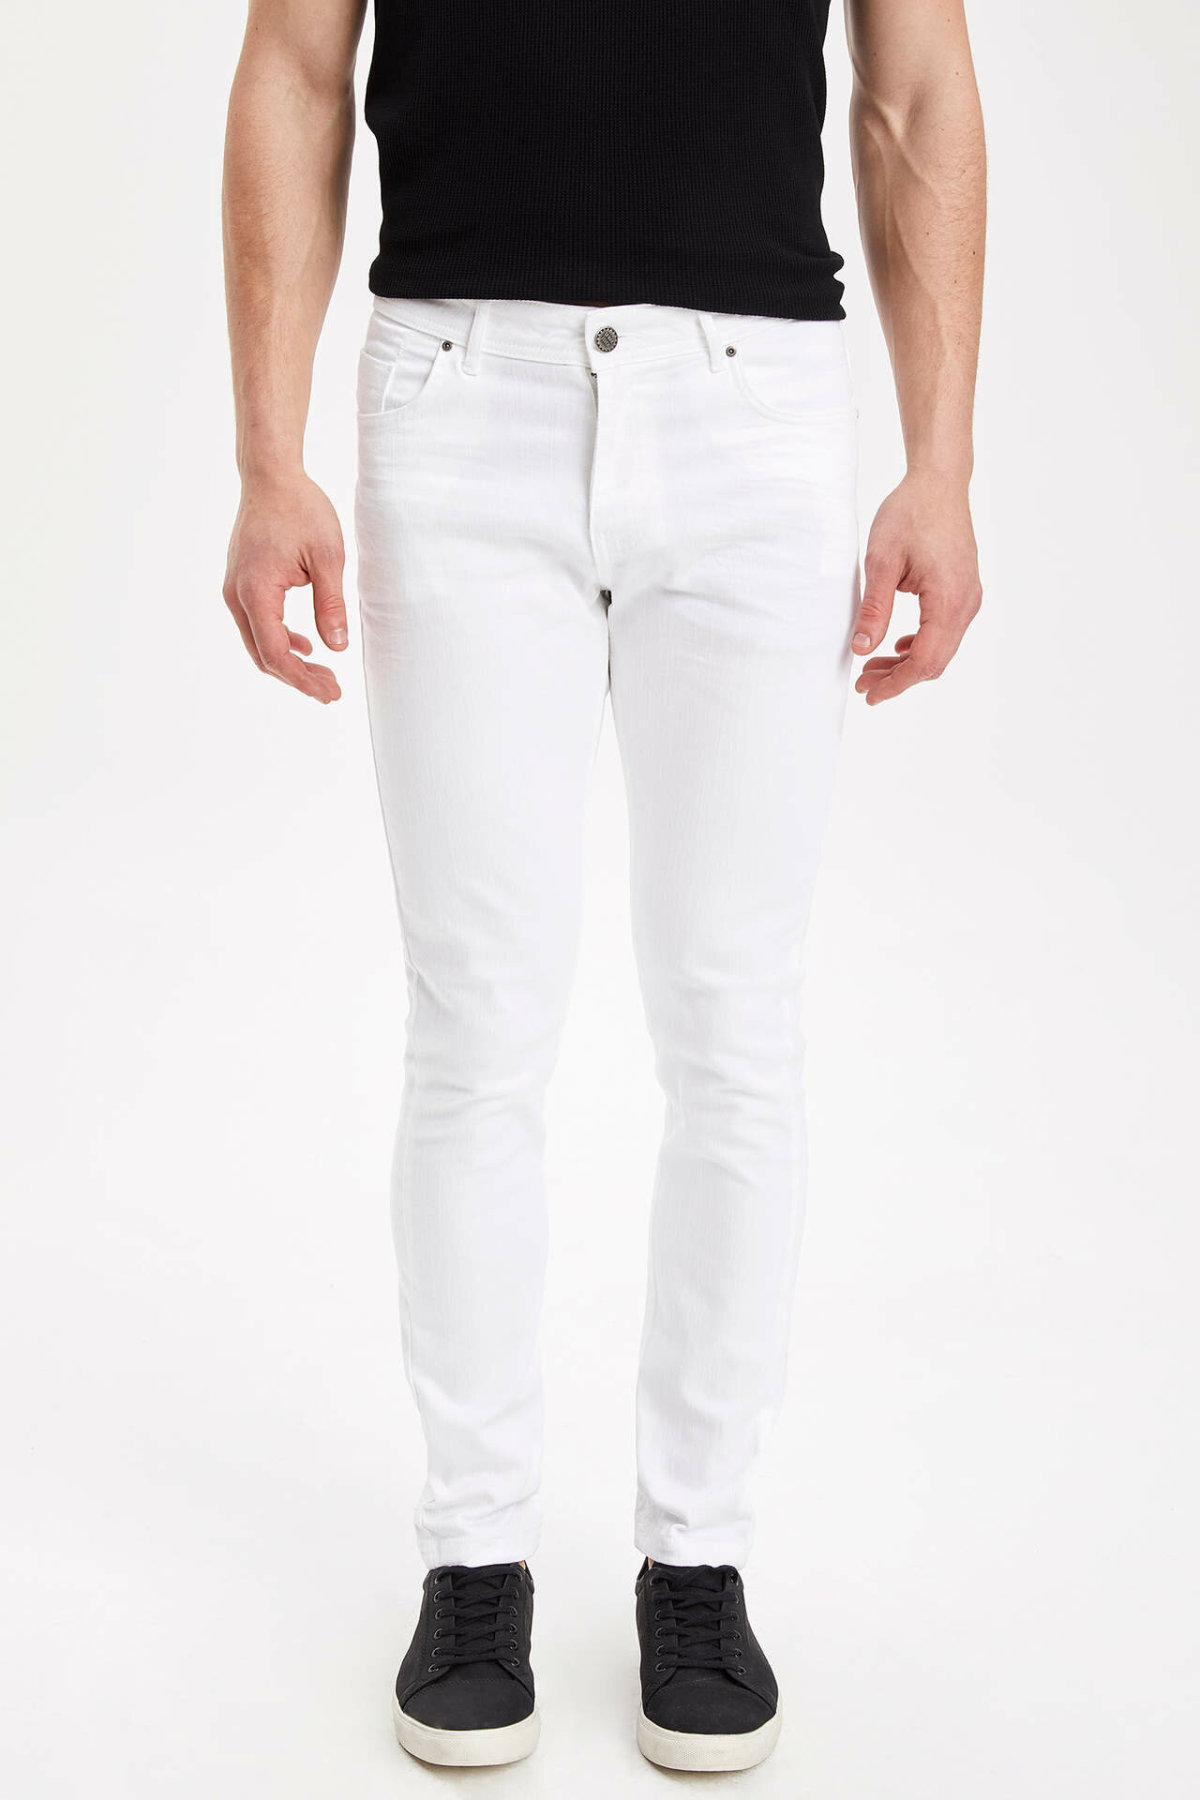 DeFacto Men Spring Denim Jeans Man Casual Straight Long Pants Male Mid-waist Solid Color Bottoms Trousers-I1209AZ18SP